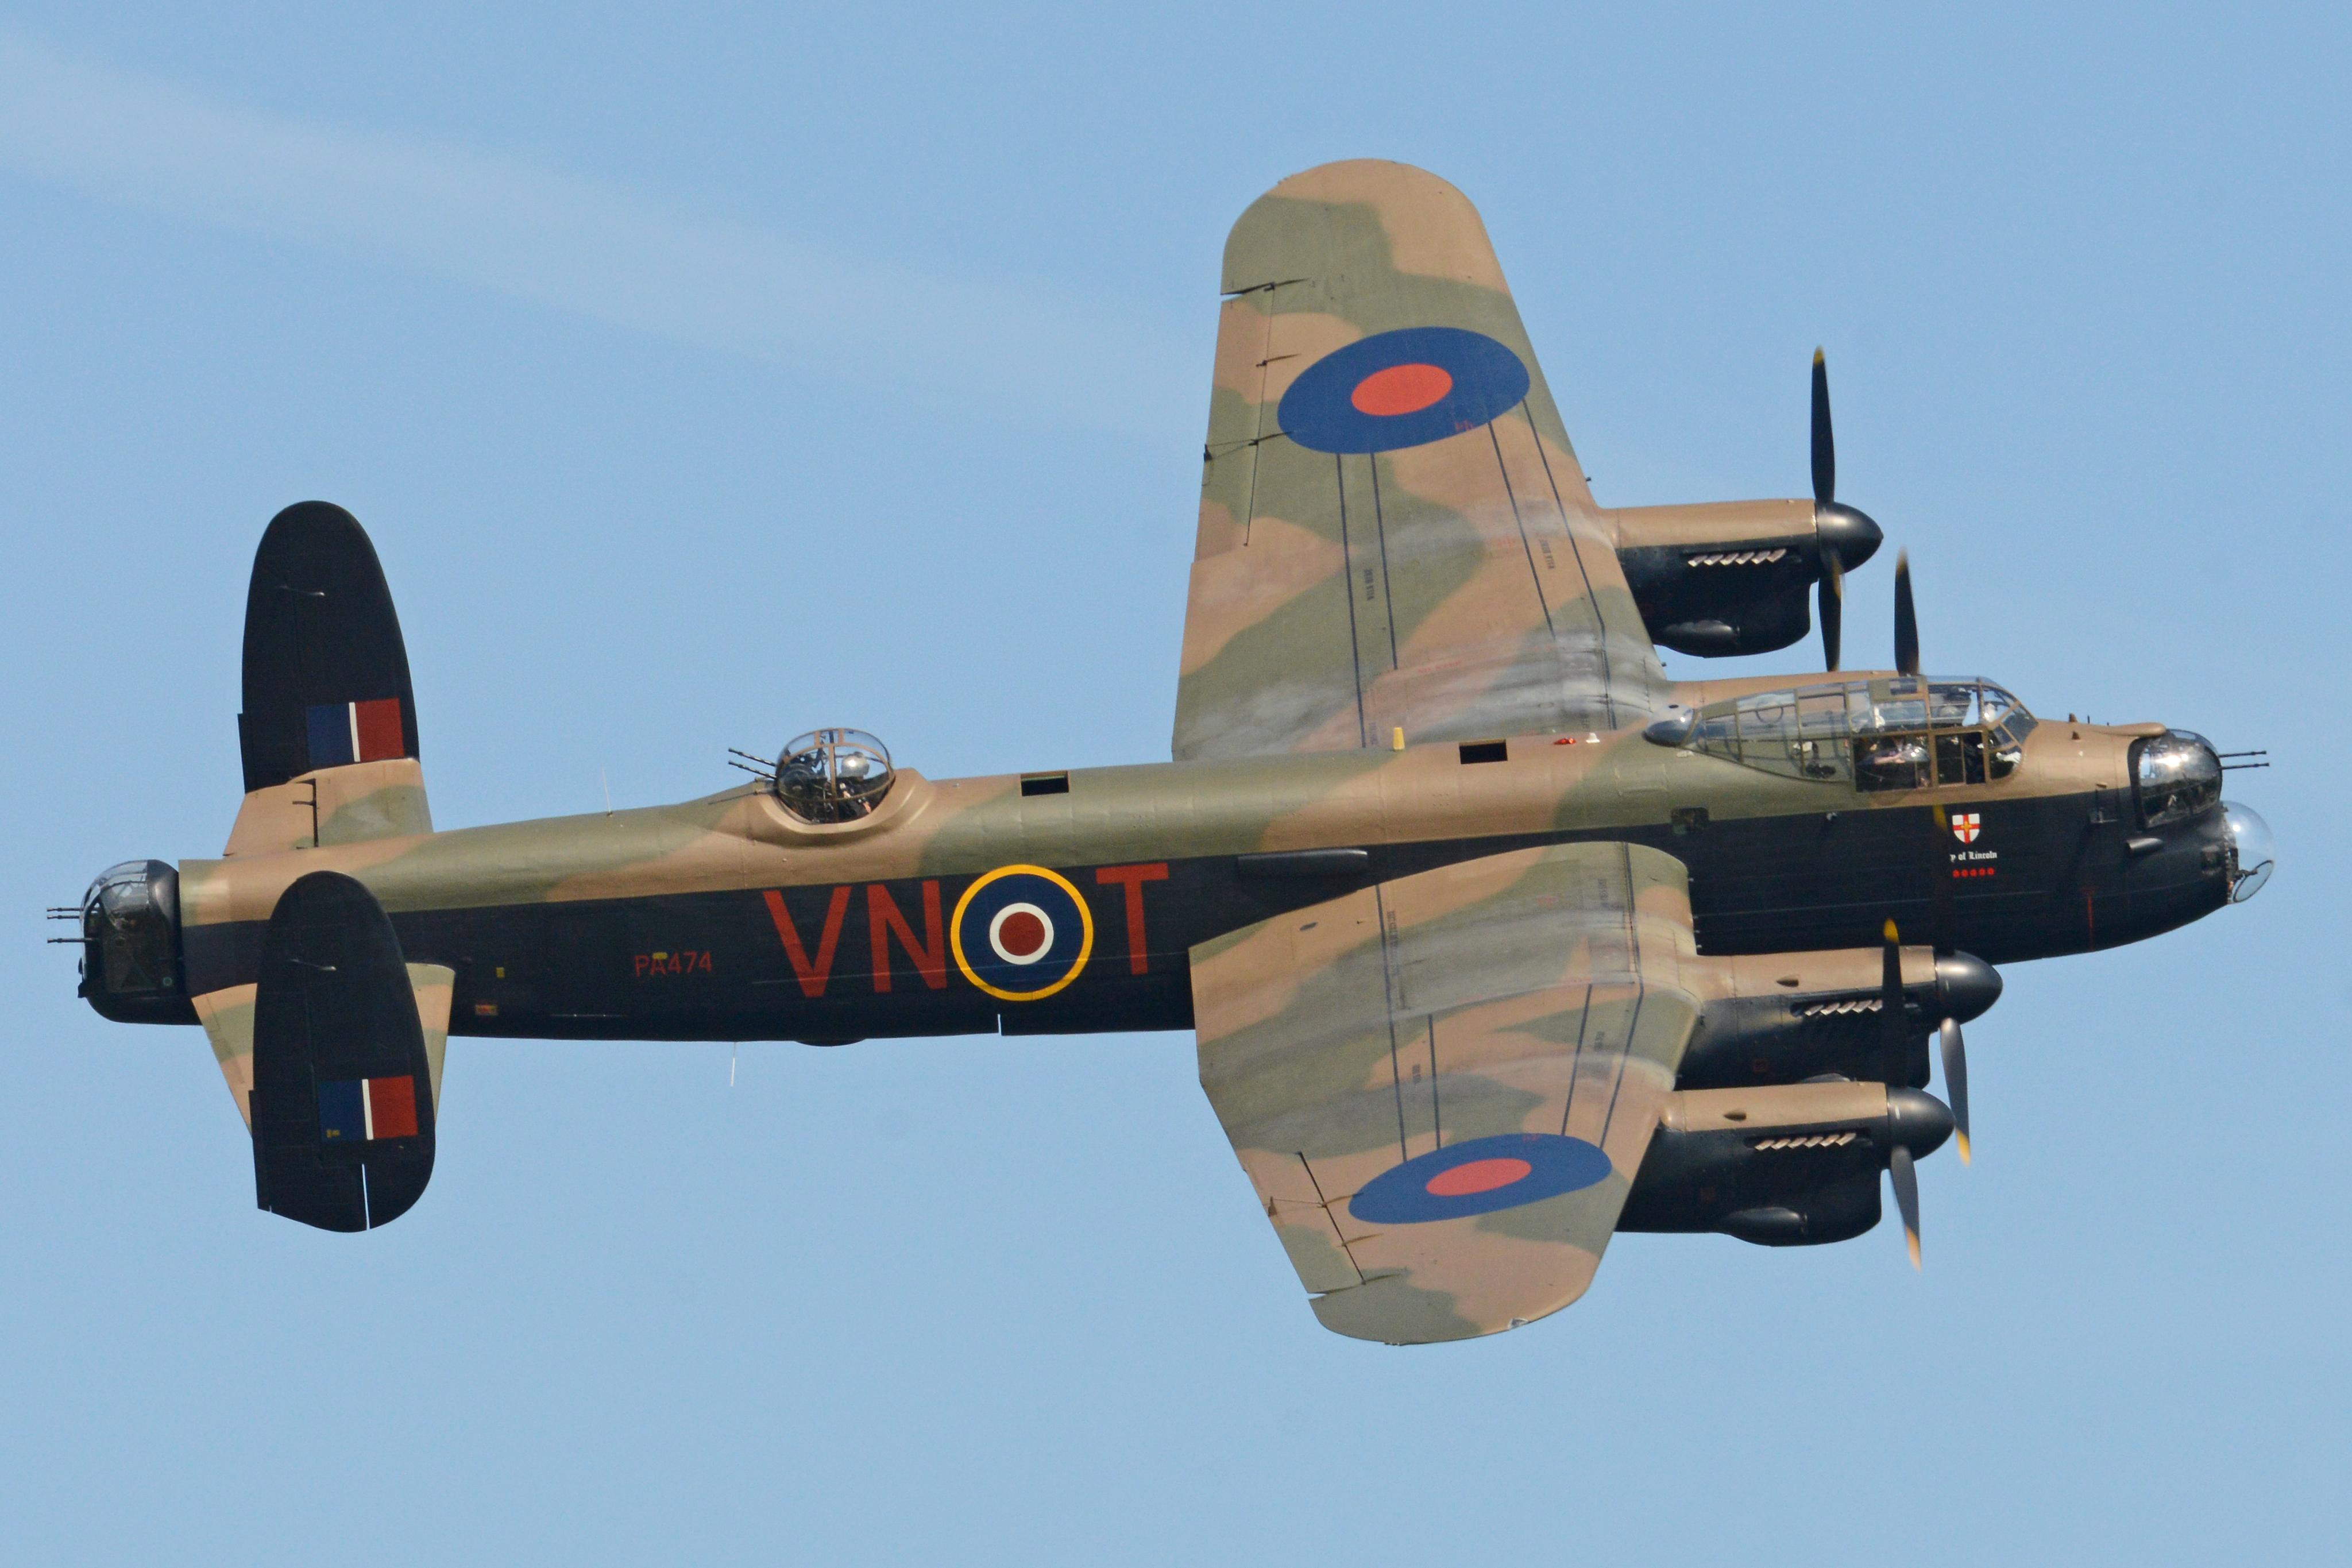 Тяжёлый бомбардировщик Авро «Ланкастер» B.I